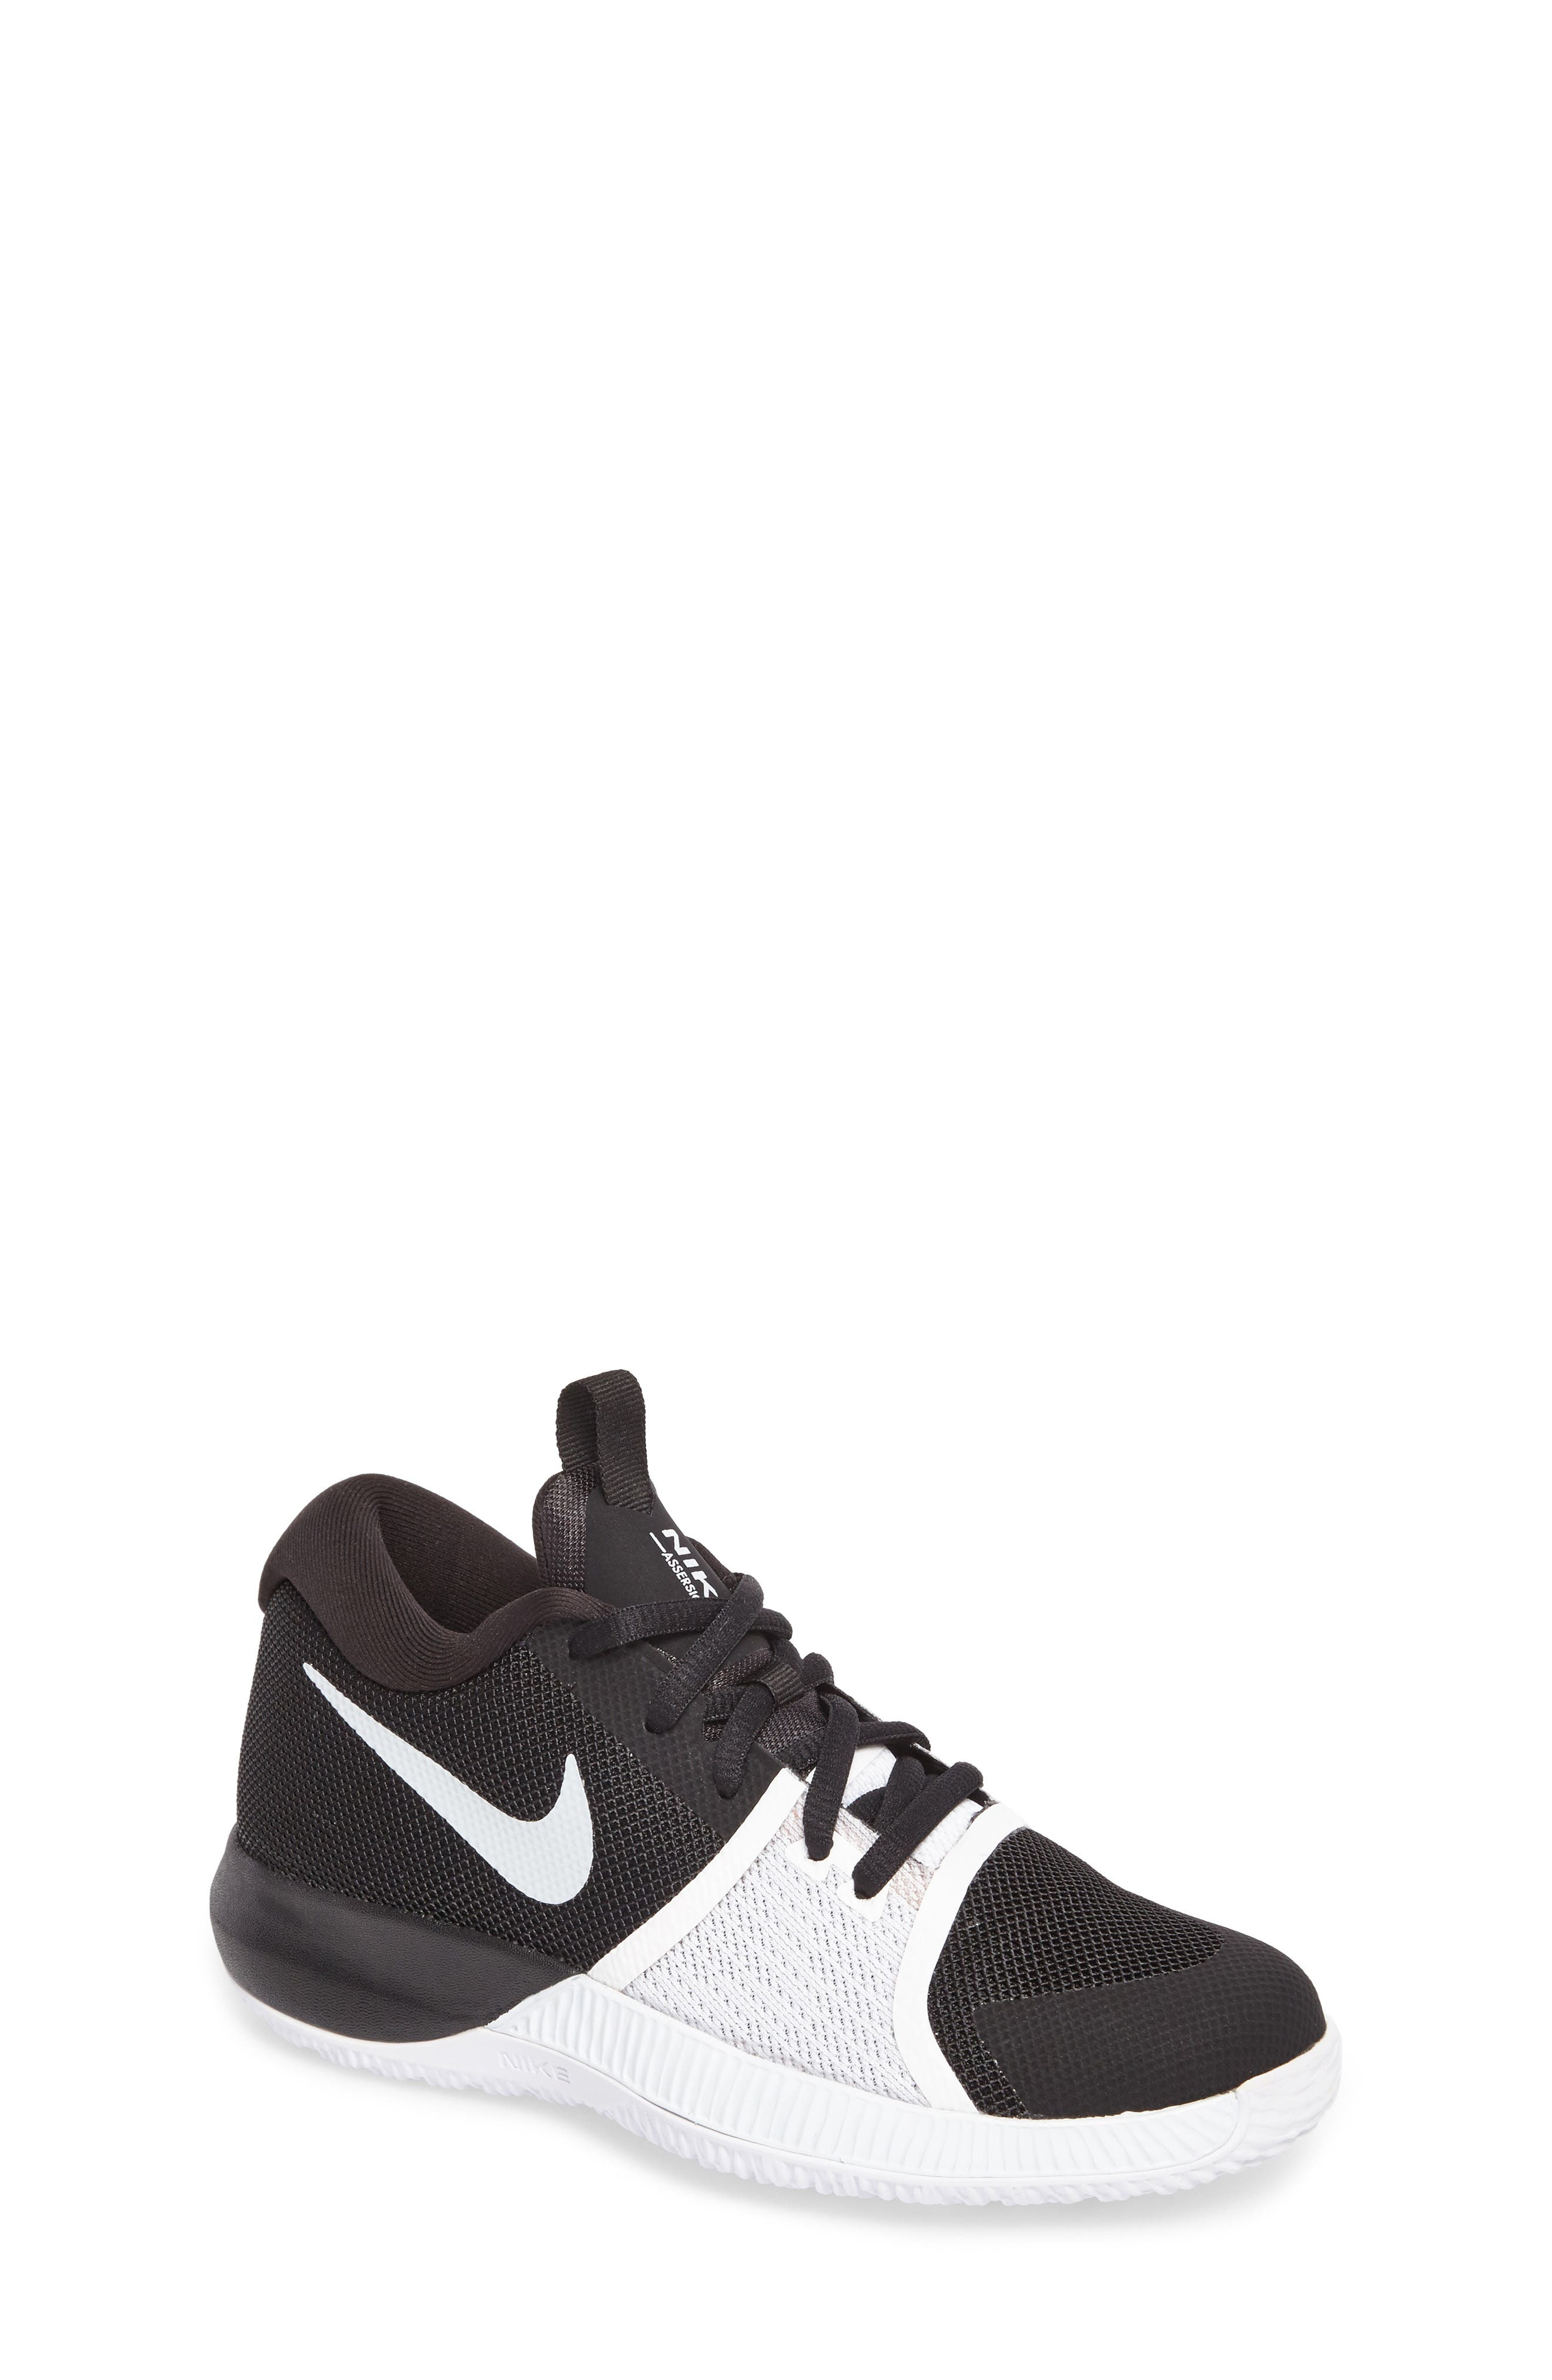 Assersion Sneaker,                         Main,                         color, Black/ White